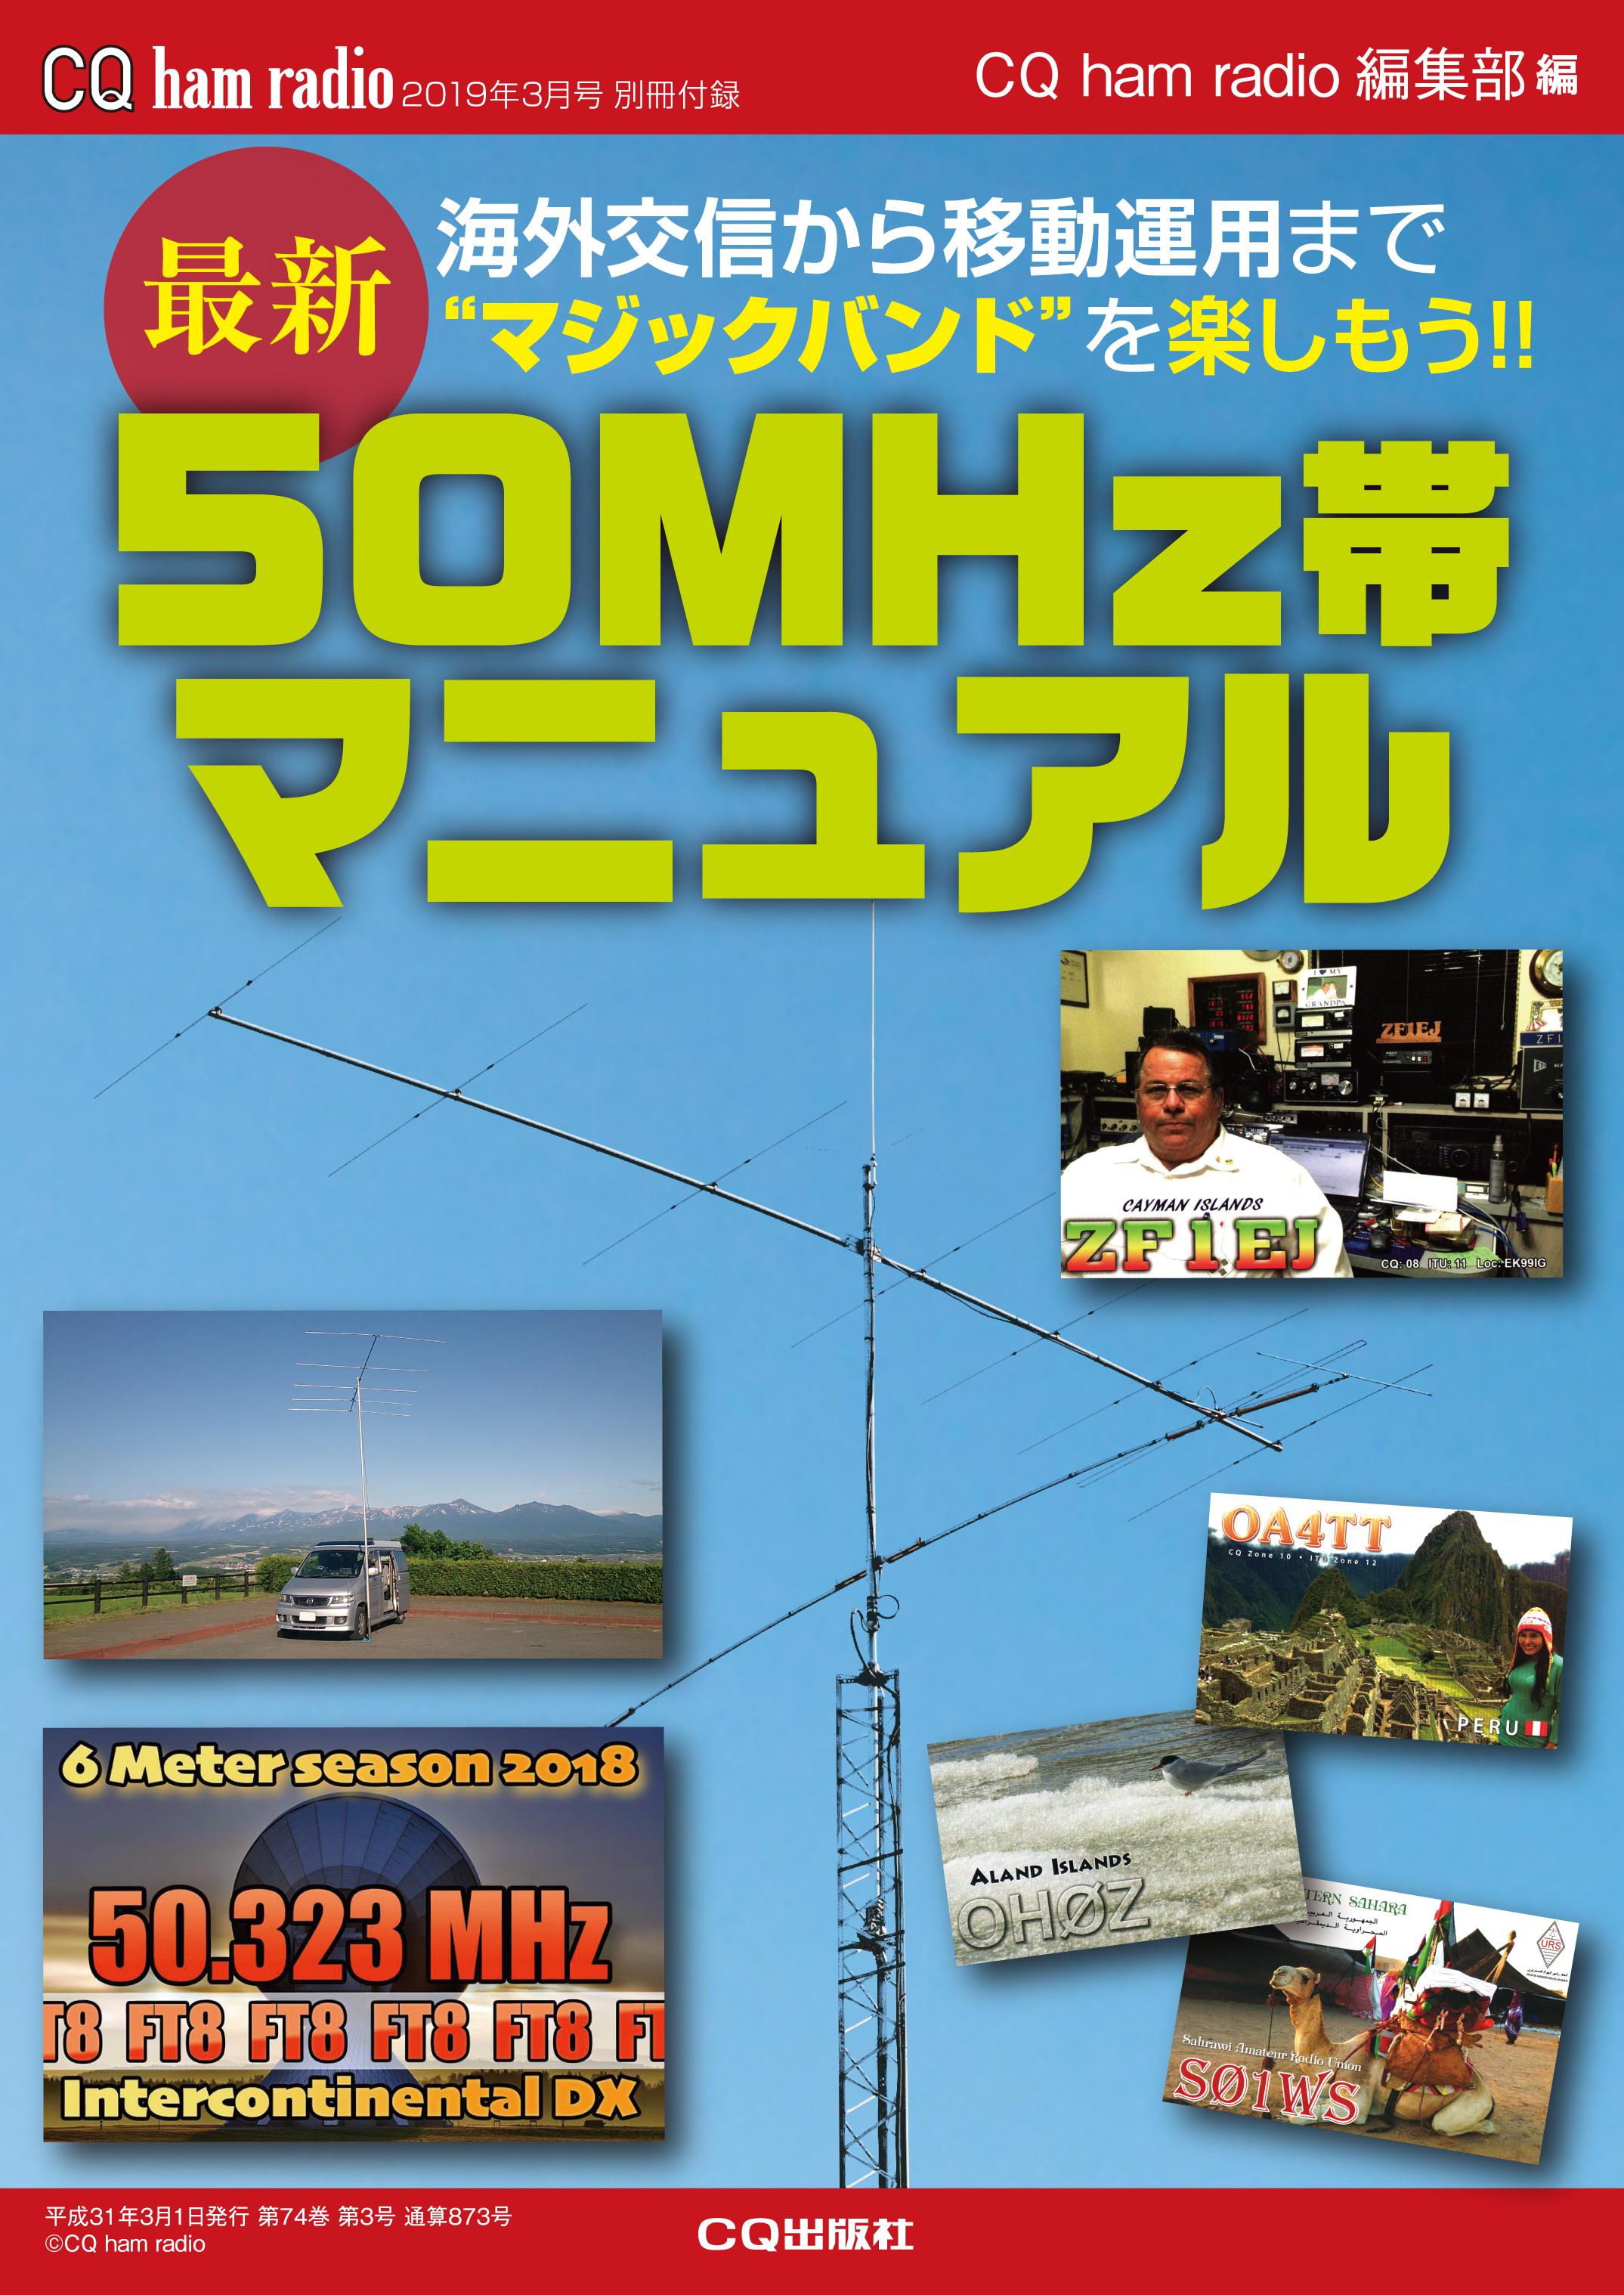 CQ ham radio 2019年3月号 別冊付録「最新 50MHz帯マニュアル」